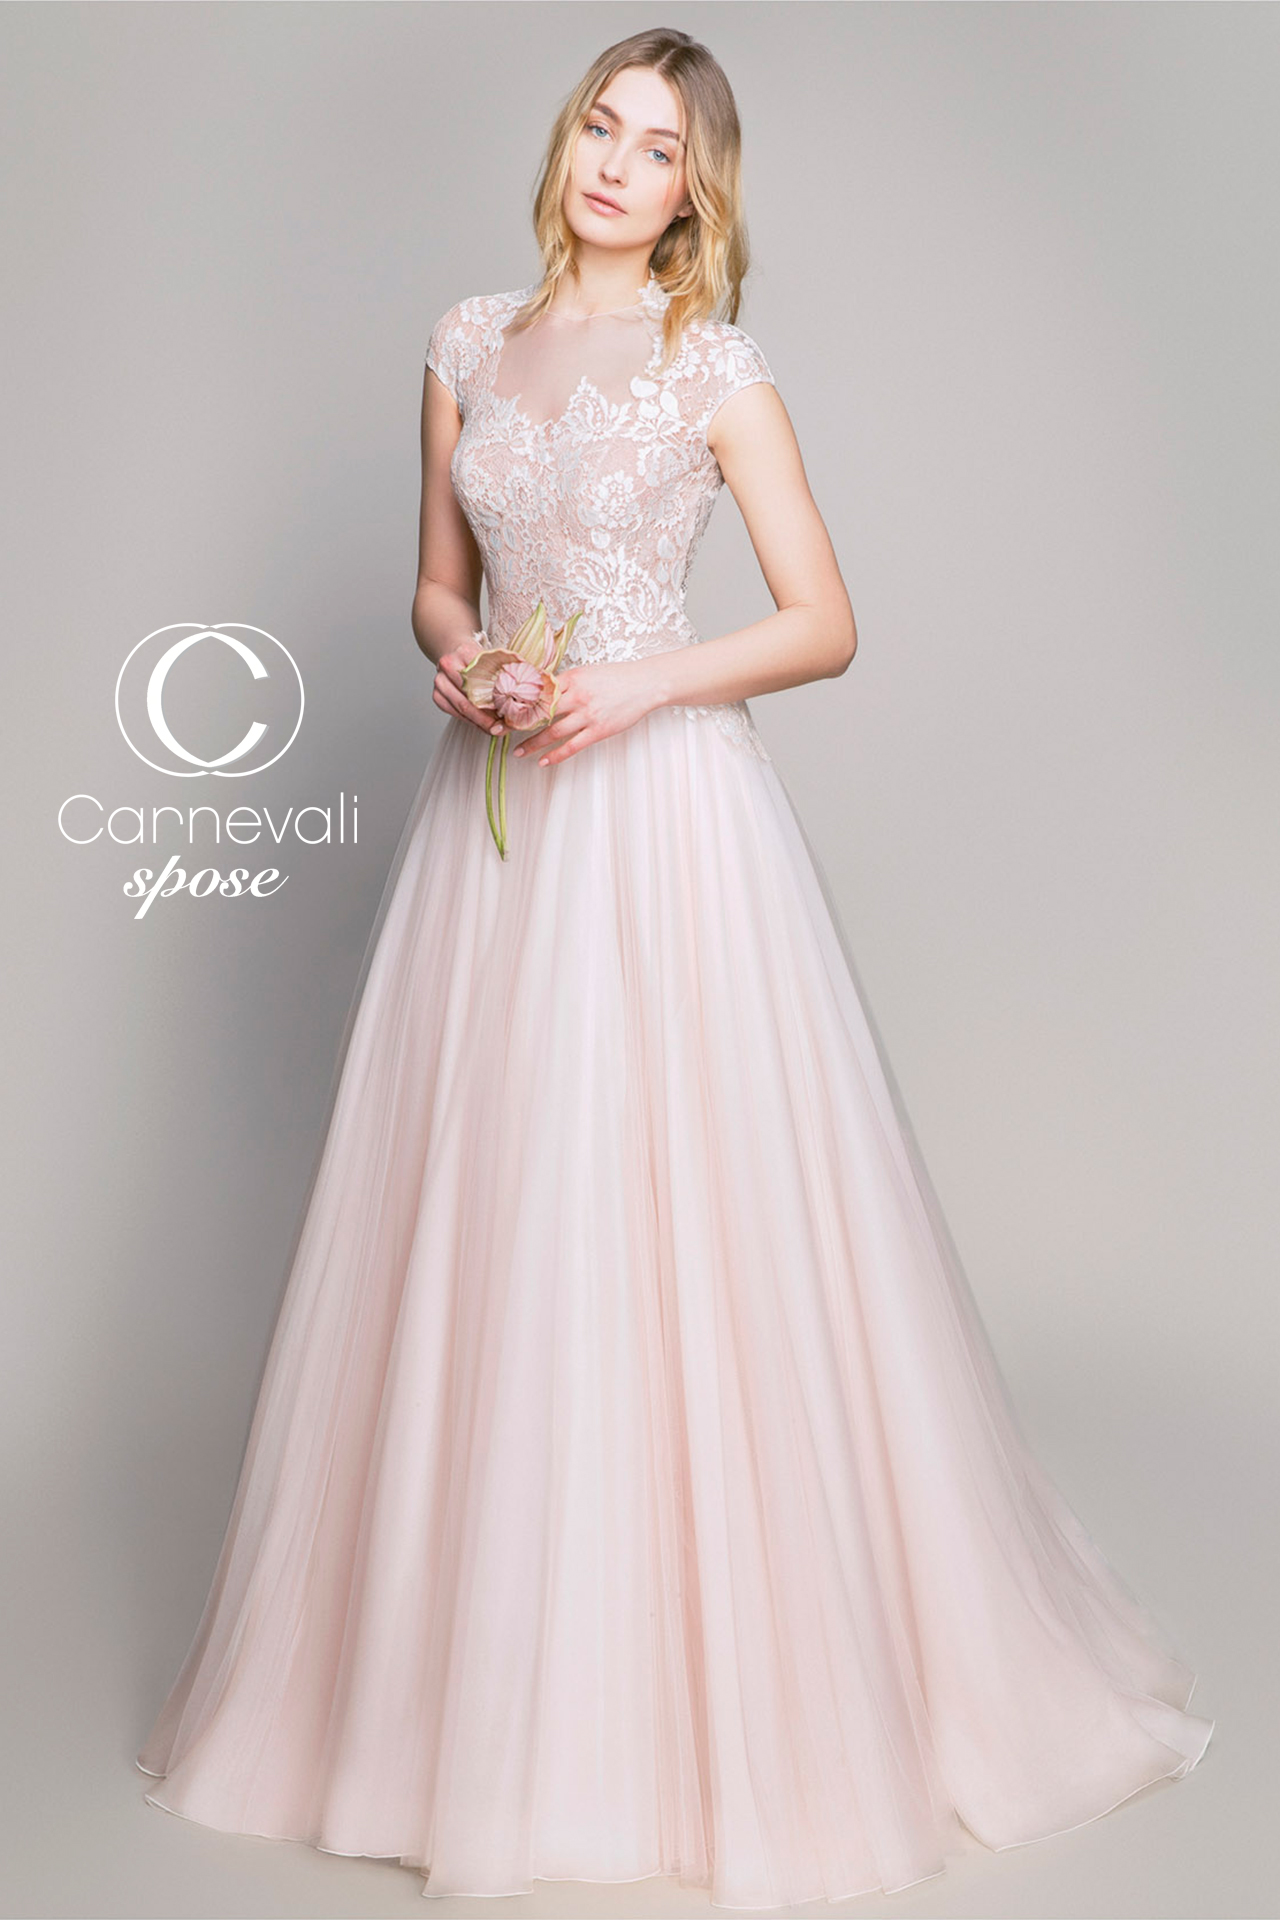 pretty nice 899f3 c9433 BLUMARINE 6760 - Carnevali Spose